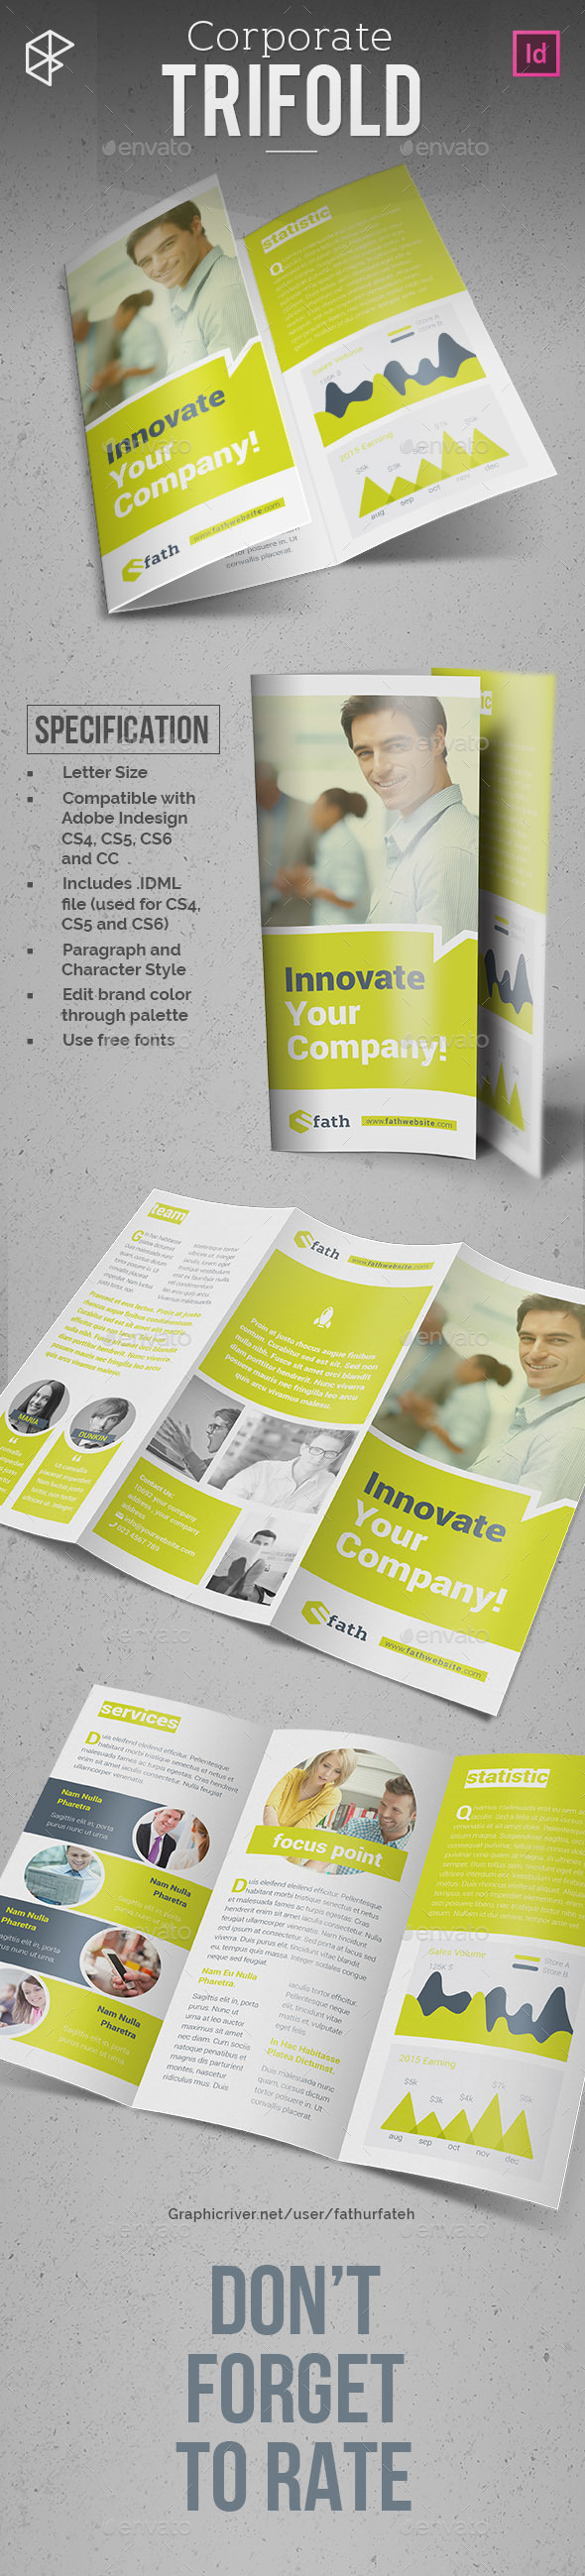 Corporate Trifold - Corporate Brochures